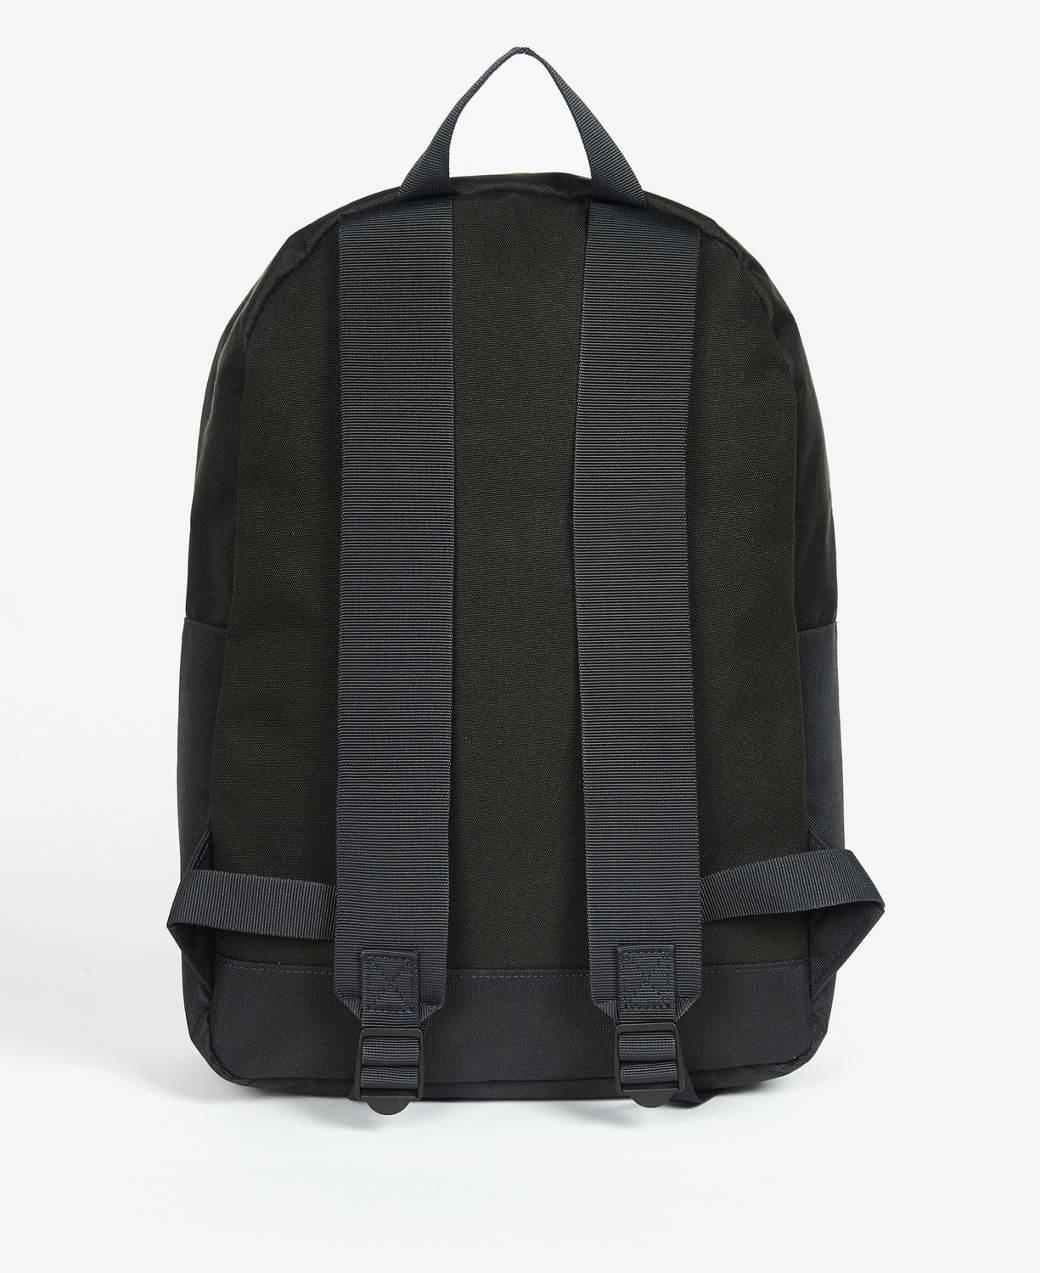 Barbour Highfield Canvas Backpack  Navy/Olive-2